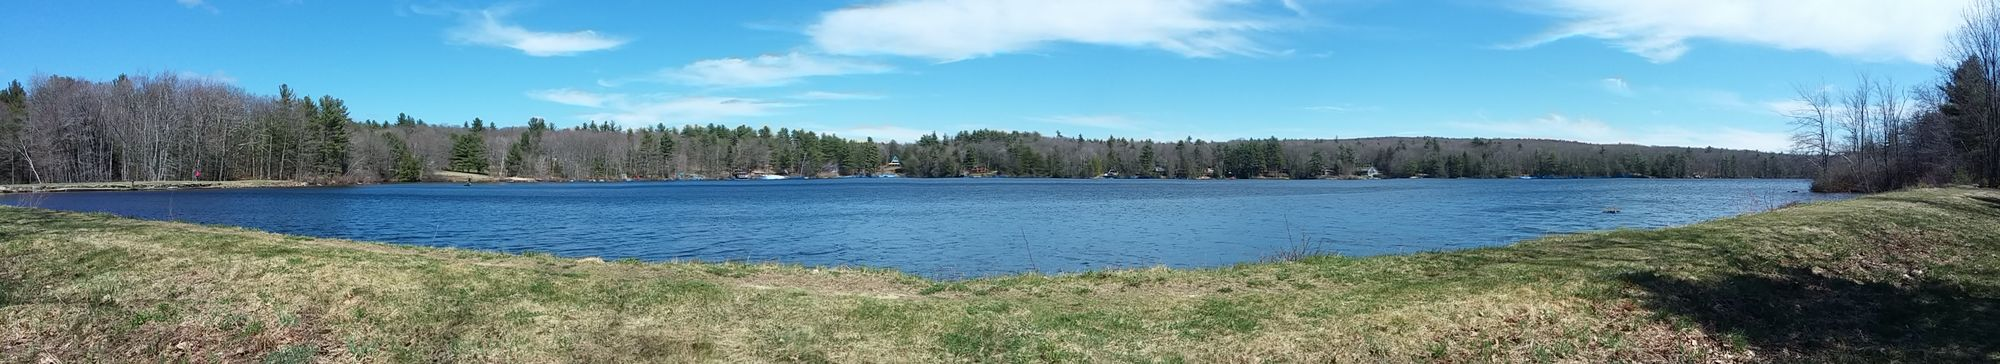 New Hampshire Fitzwilliam Pond Lovers Nature Panorama Scenic Walk Water Pond